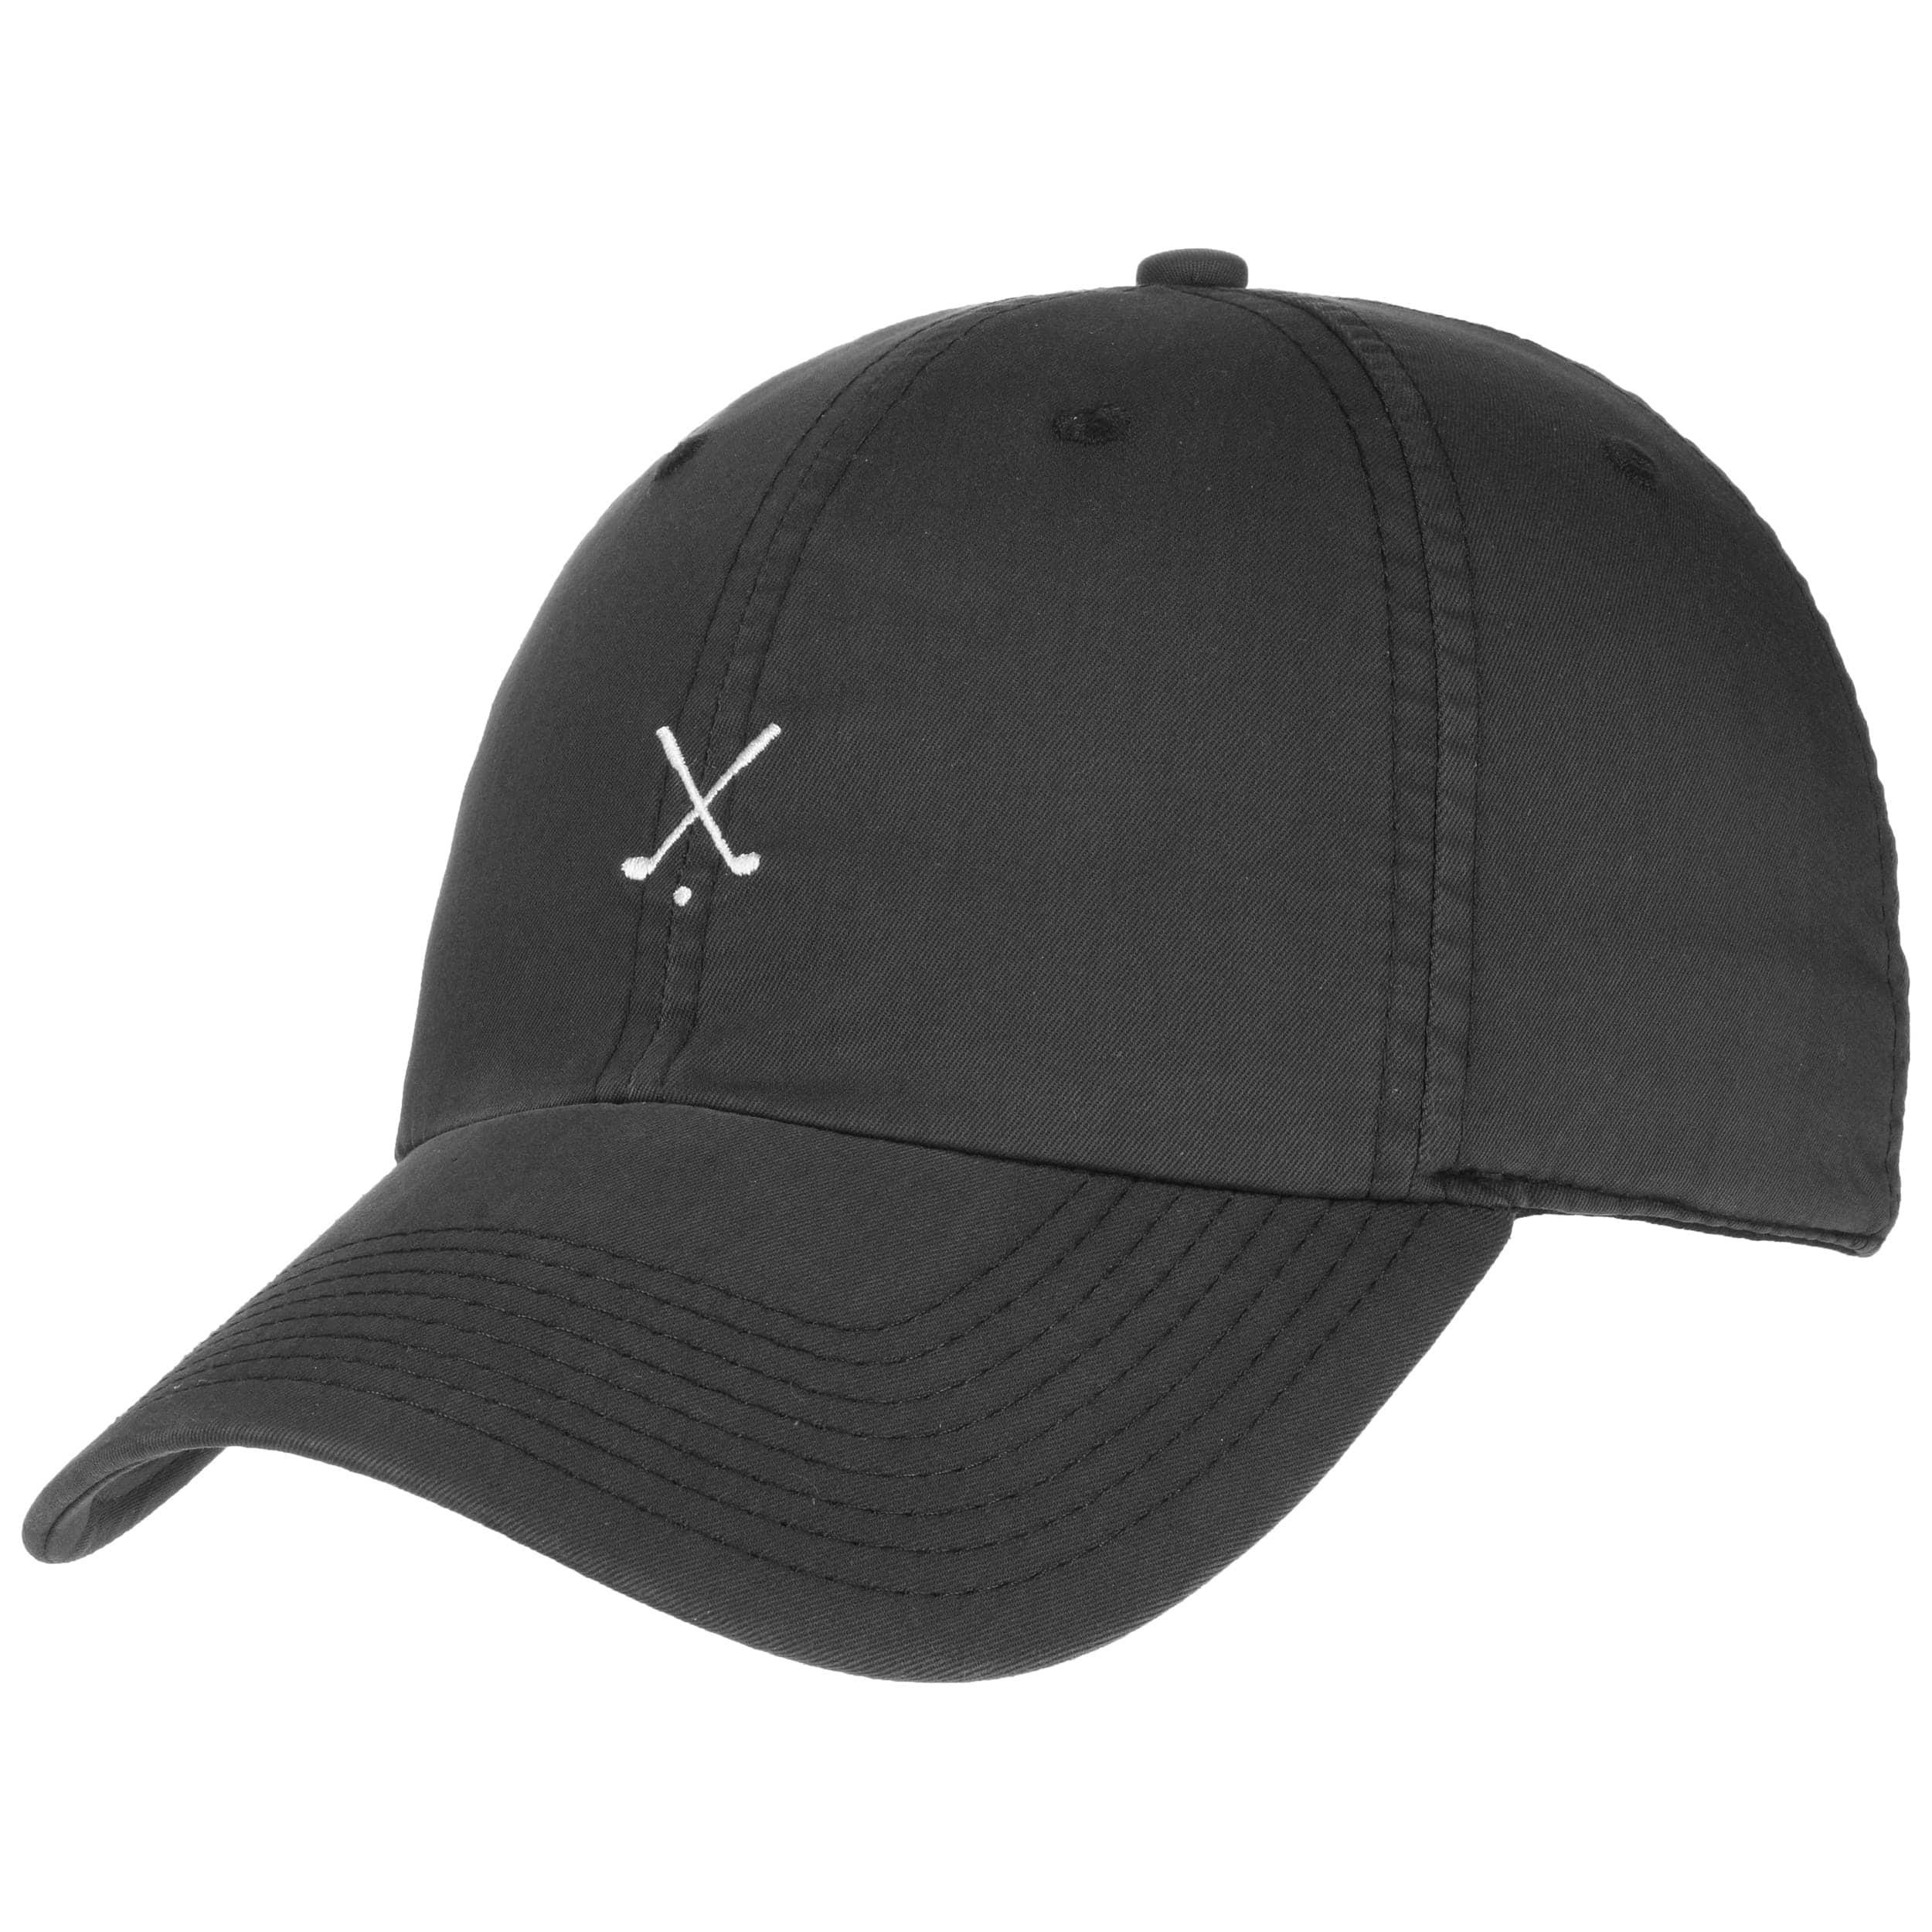 077ef 28b4b top quality heritage 86 cap by nike 2 c8f60 19c2f clearance nike  sb dry snapback hat black grey the boardroom 4e278 26cfa ... 49cd08eb5718